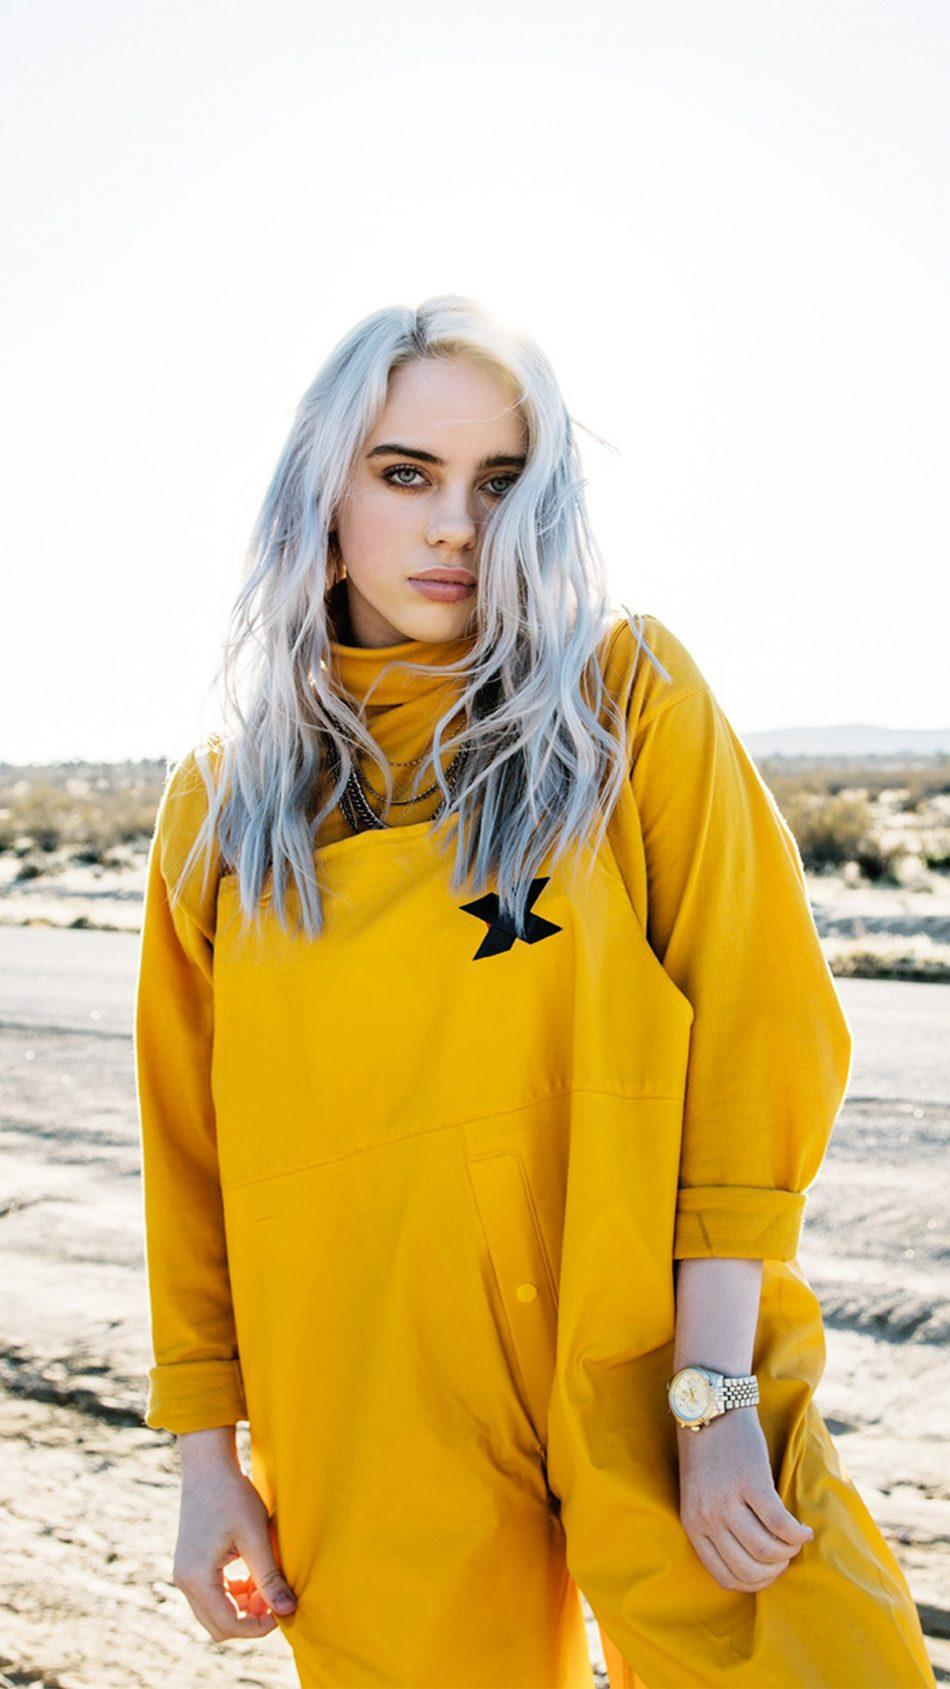 Billie Eilish Beautiful Look